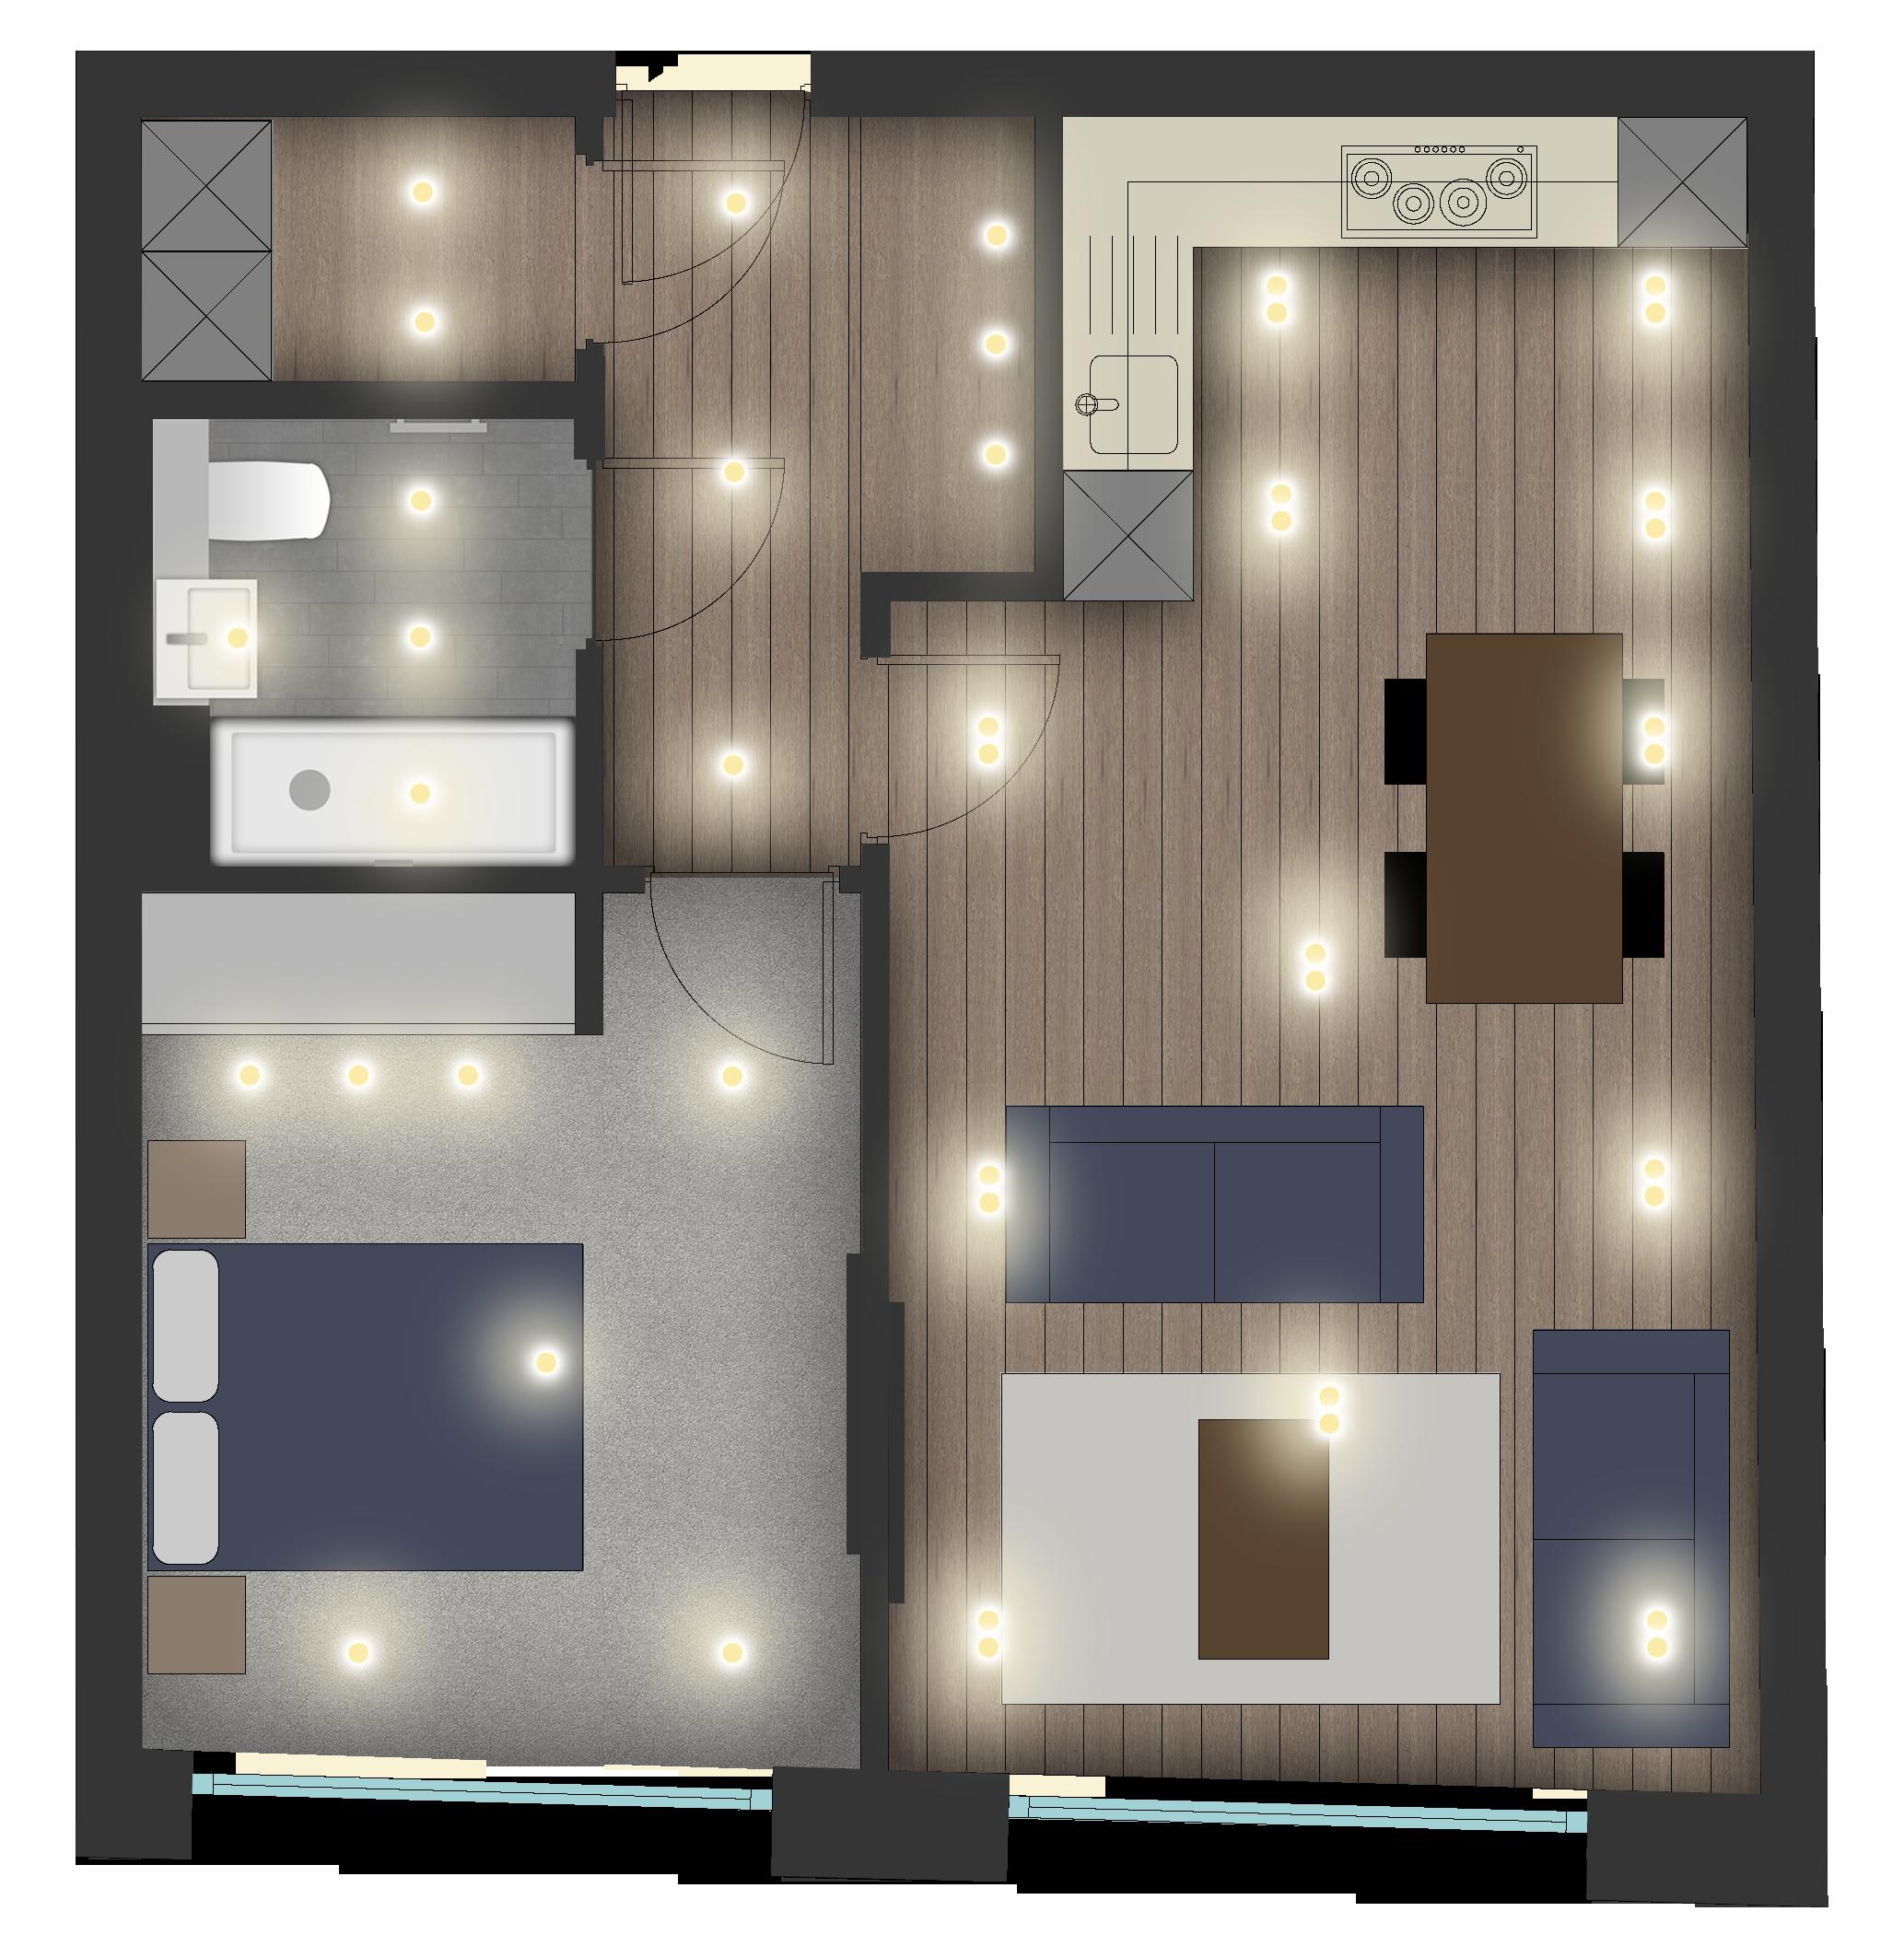 Bernard morgan house bathroom-1-50 Flat Layout.png